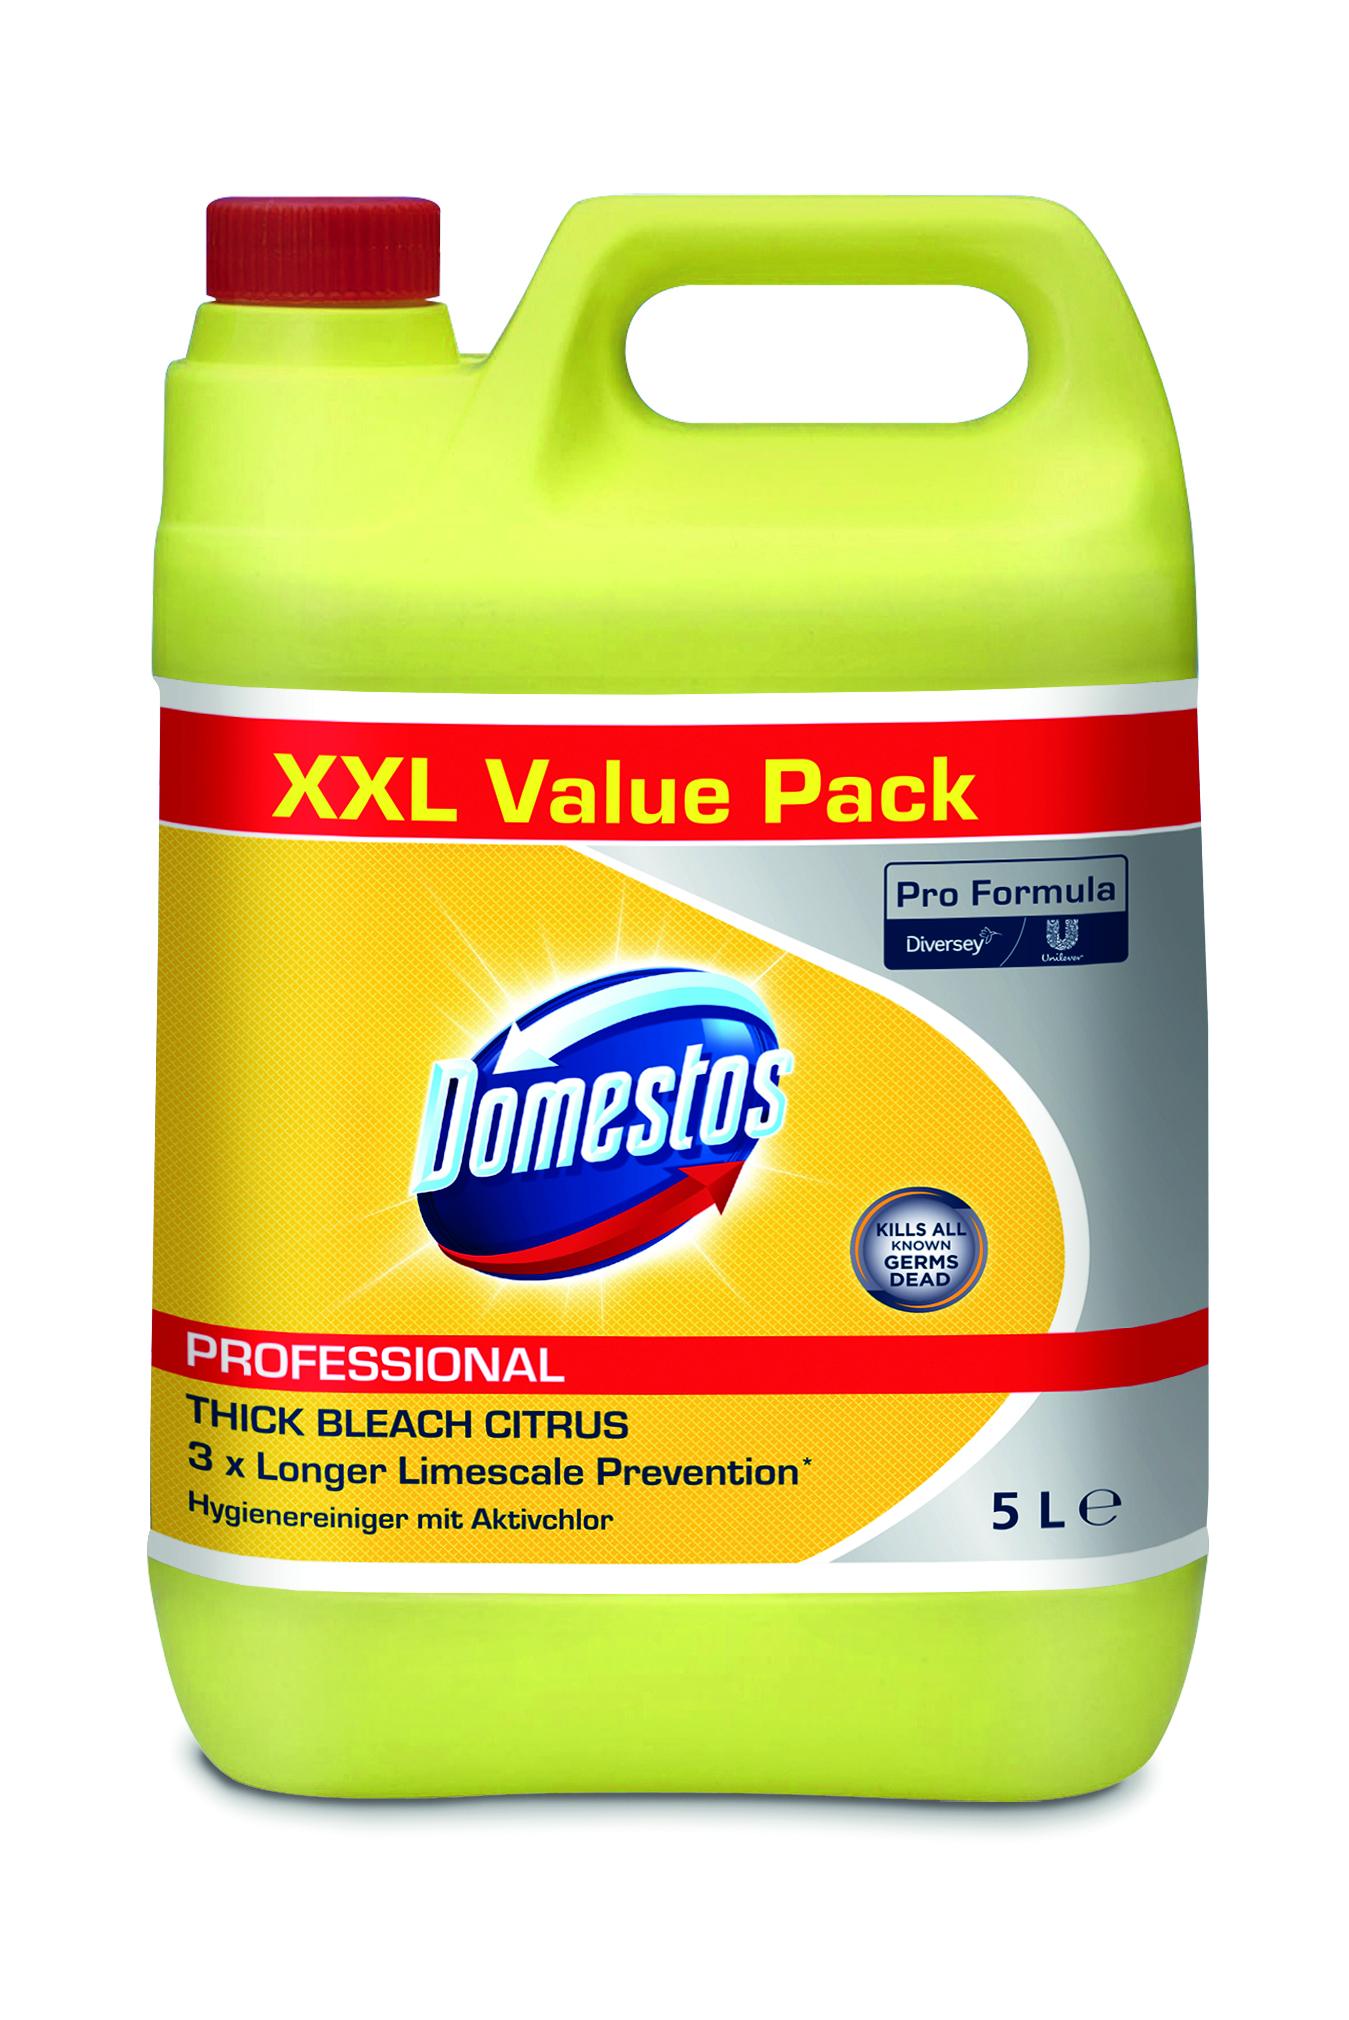 Domestos Professional Hygienereiniger Citrus mit Aktiv-Chlor 5L